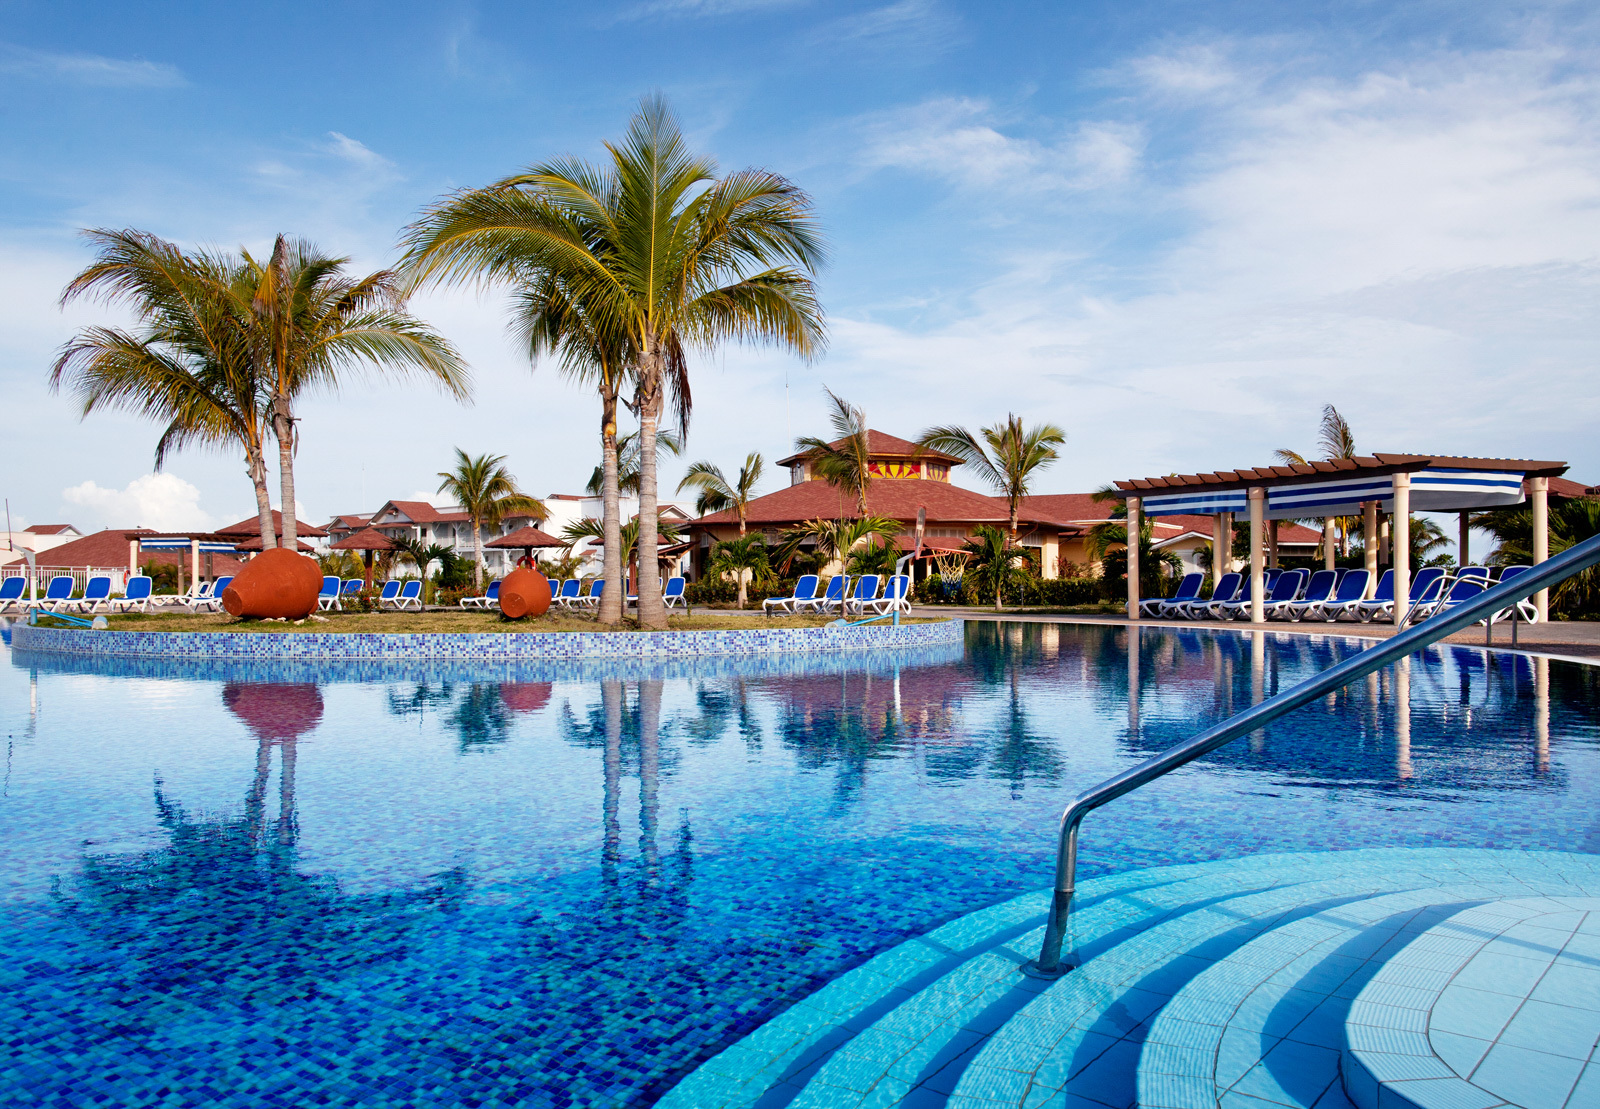 Cayo Coco Hotels And Resorts